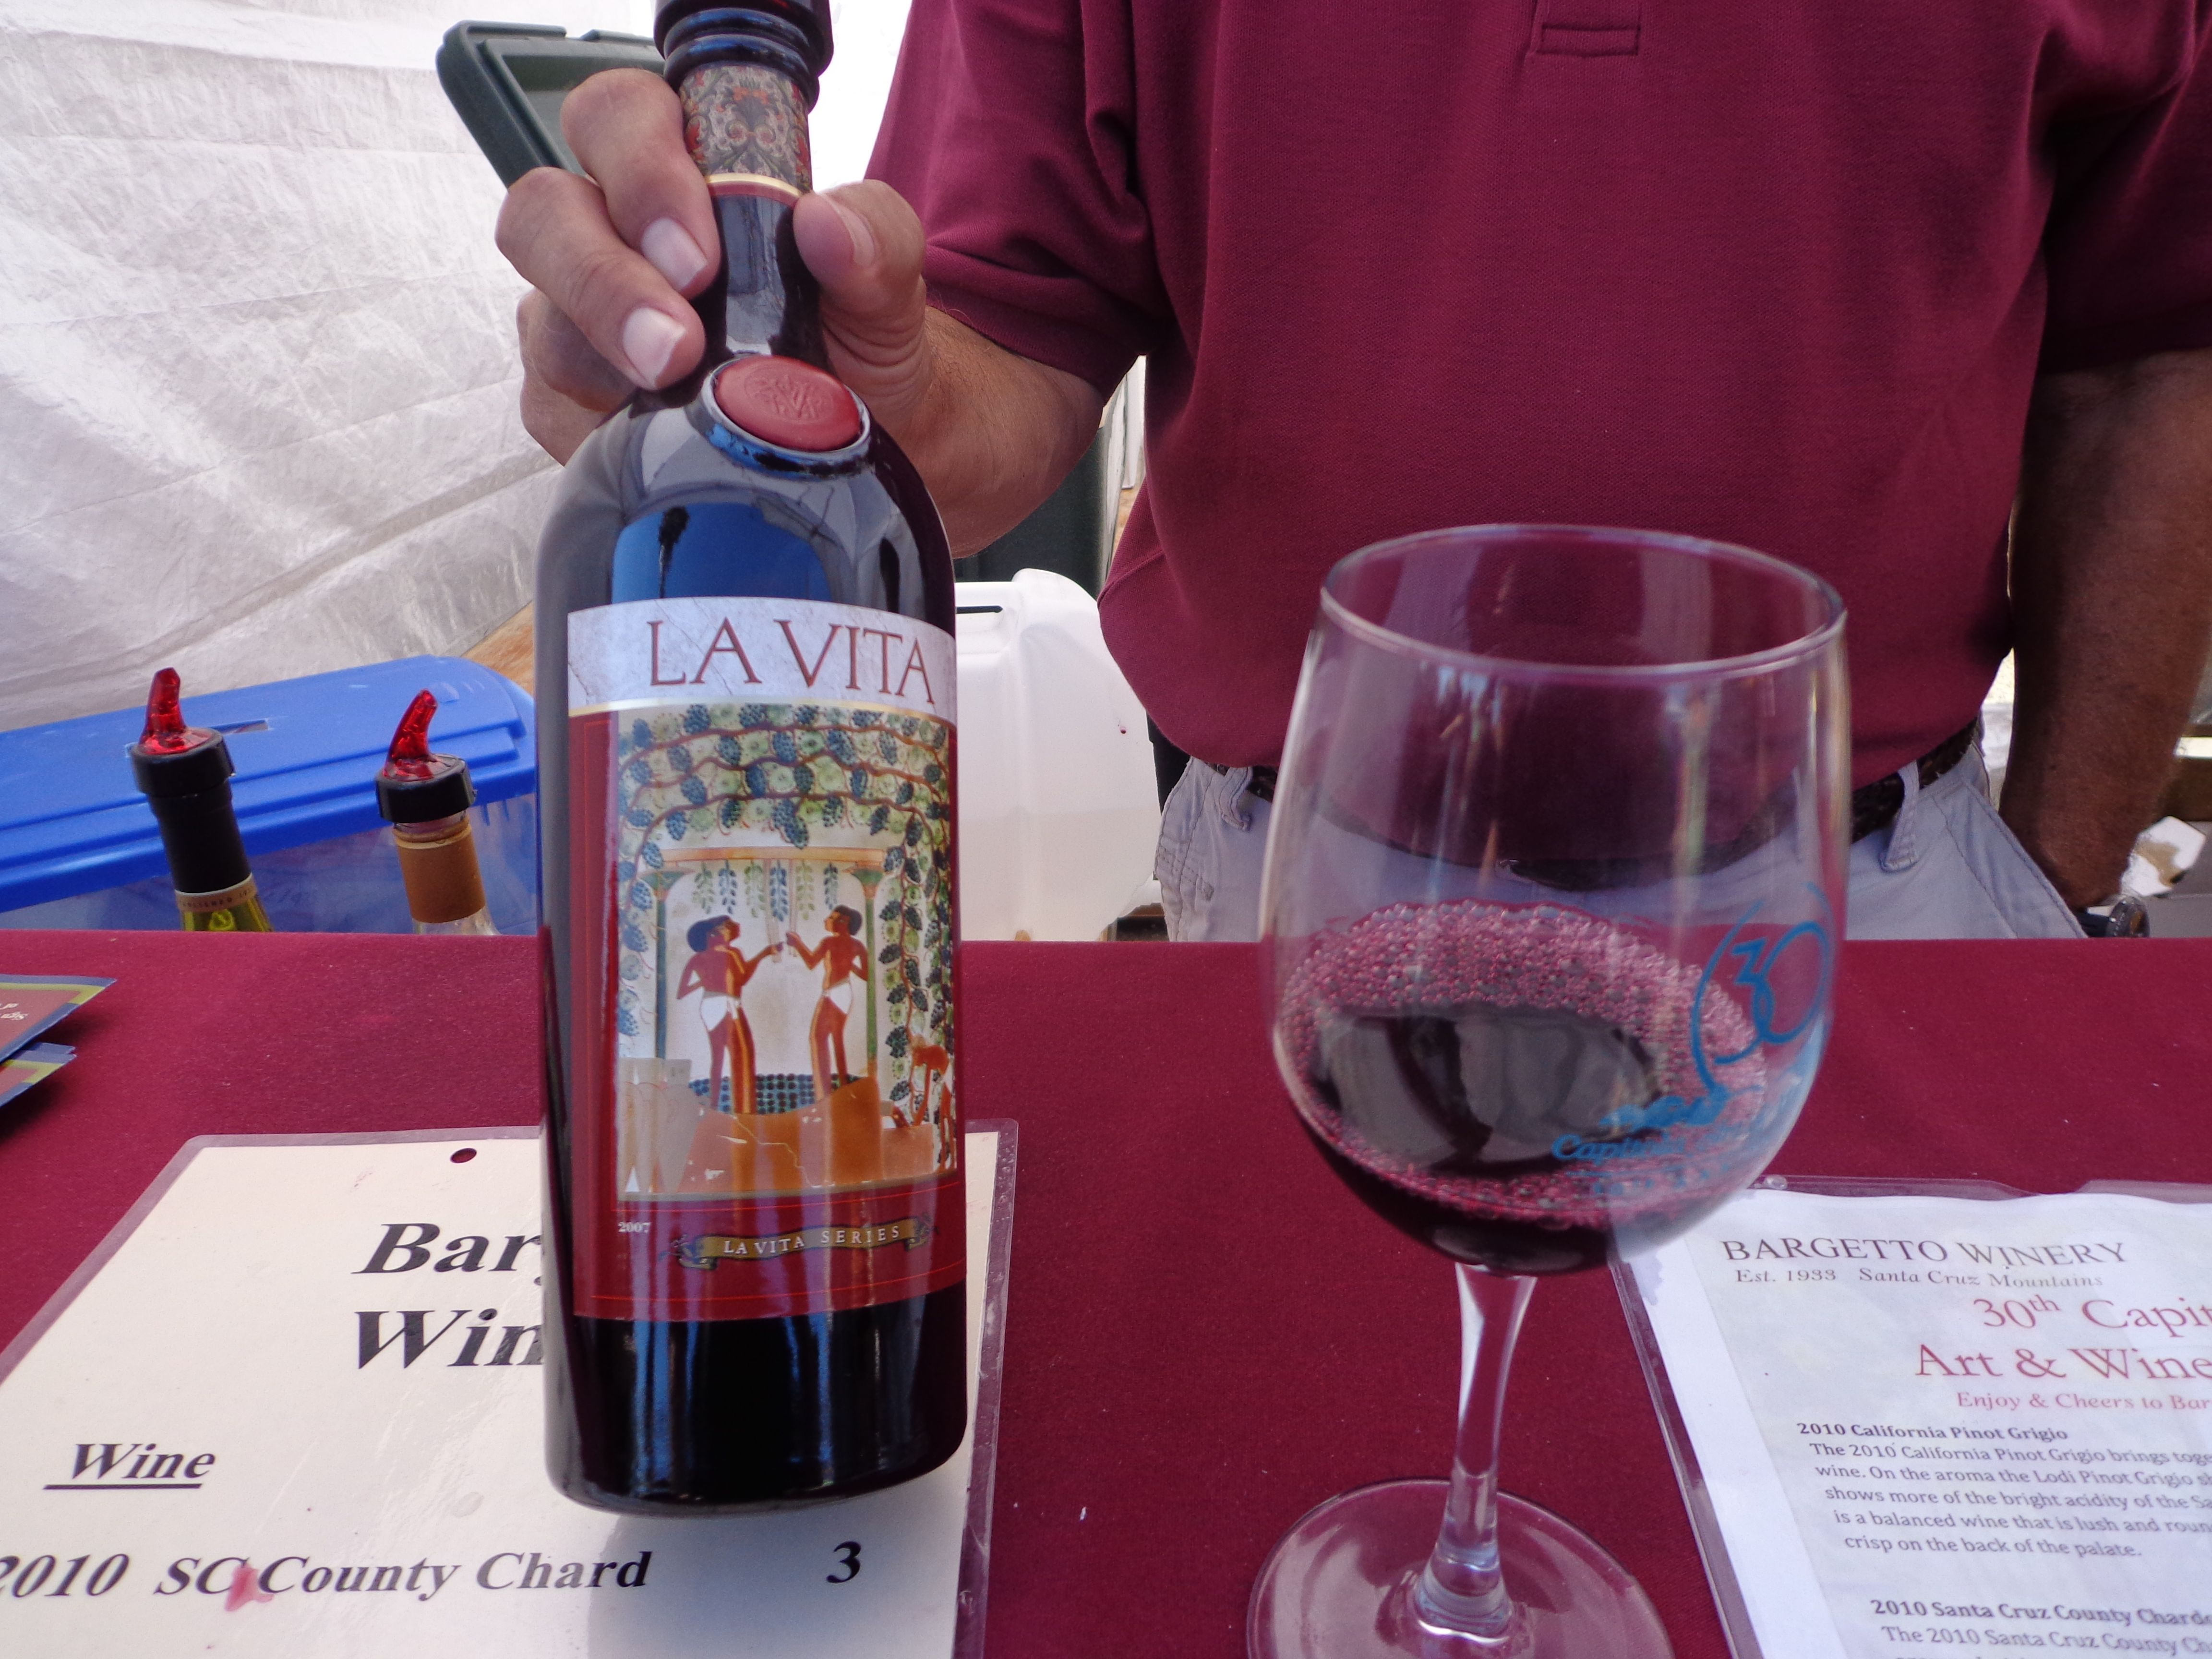 La Vita From Bargetto Winery Wine Festival Winery Win Art